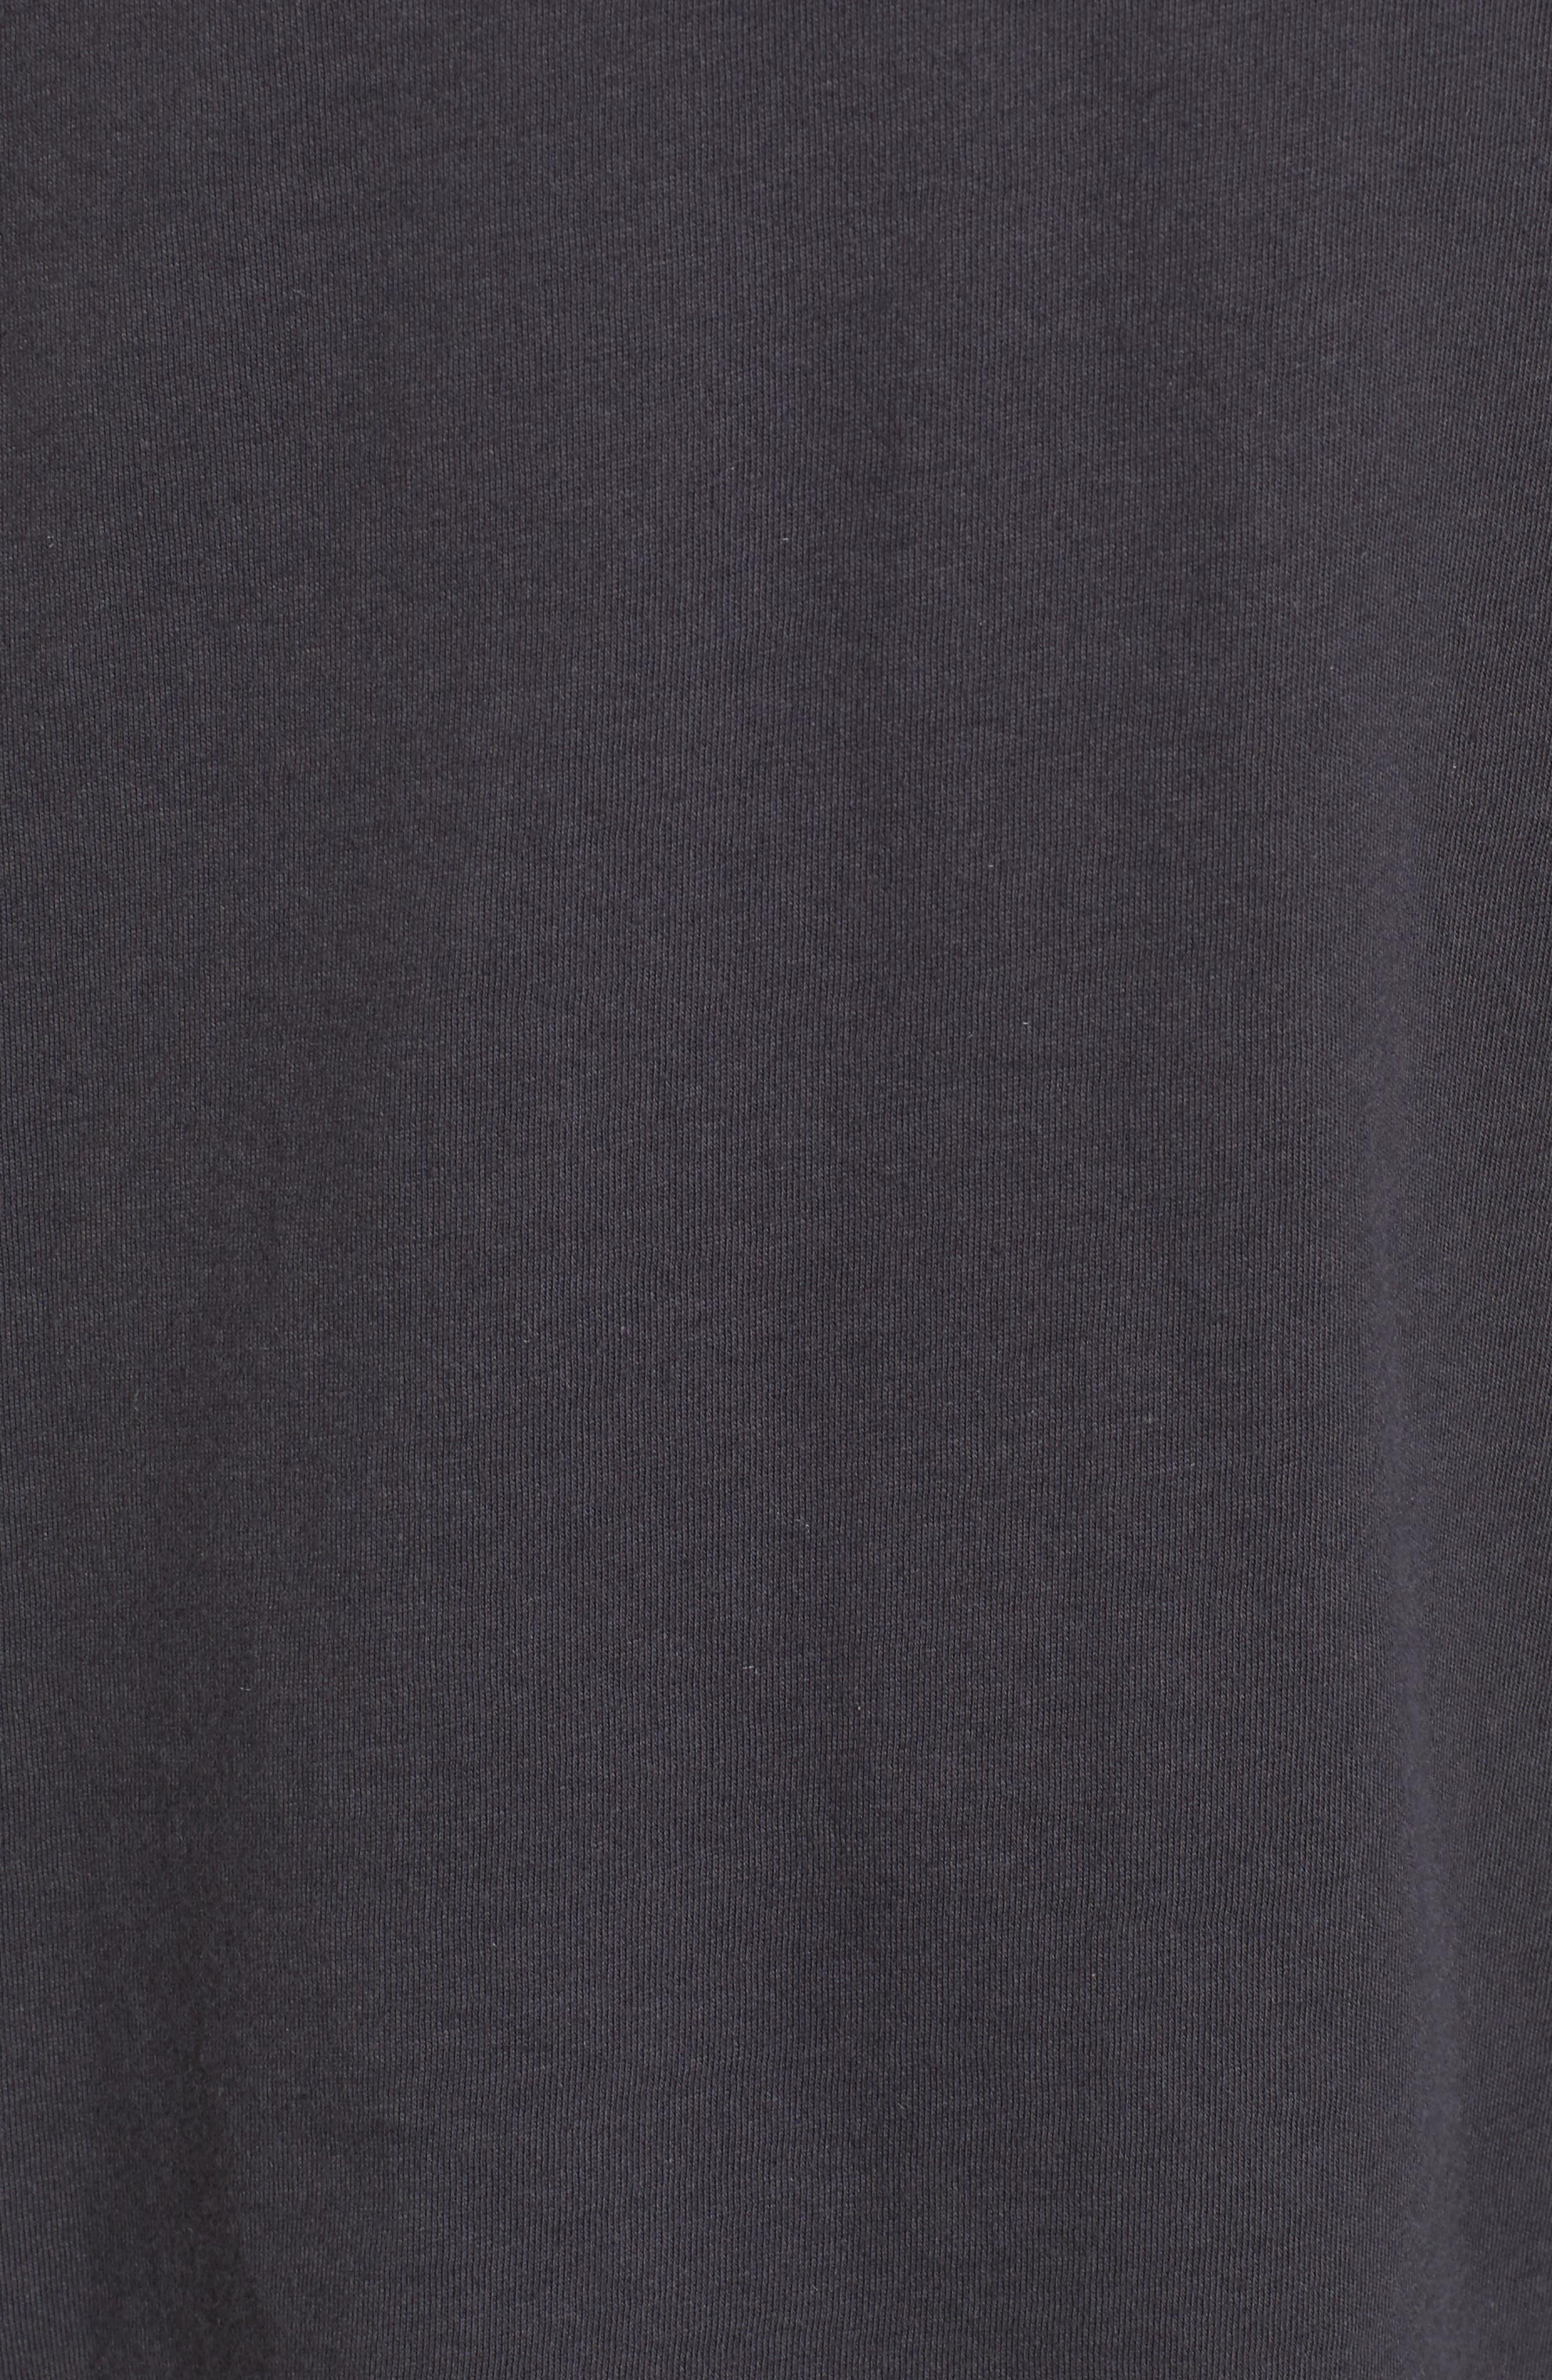 Long Sleeve V Neck Pocket Tee,                             Alternate thumbnail 5, color,                             020